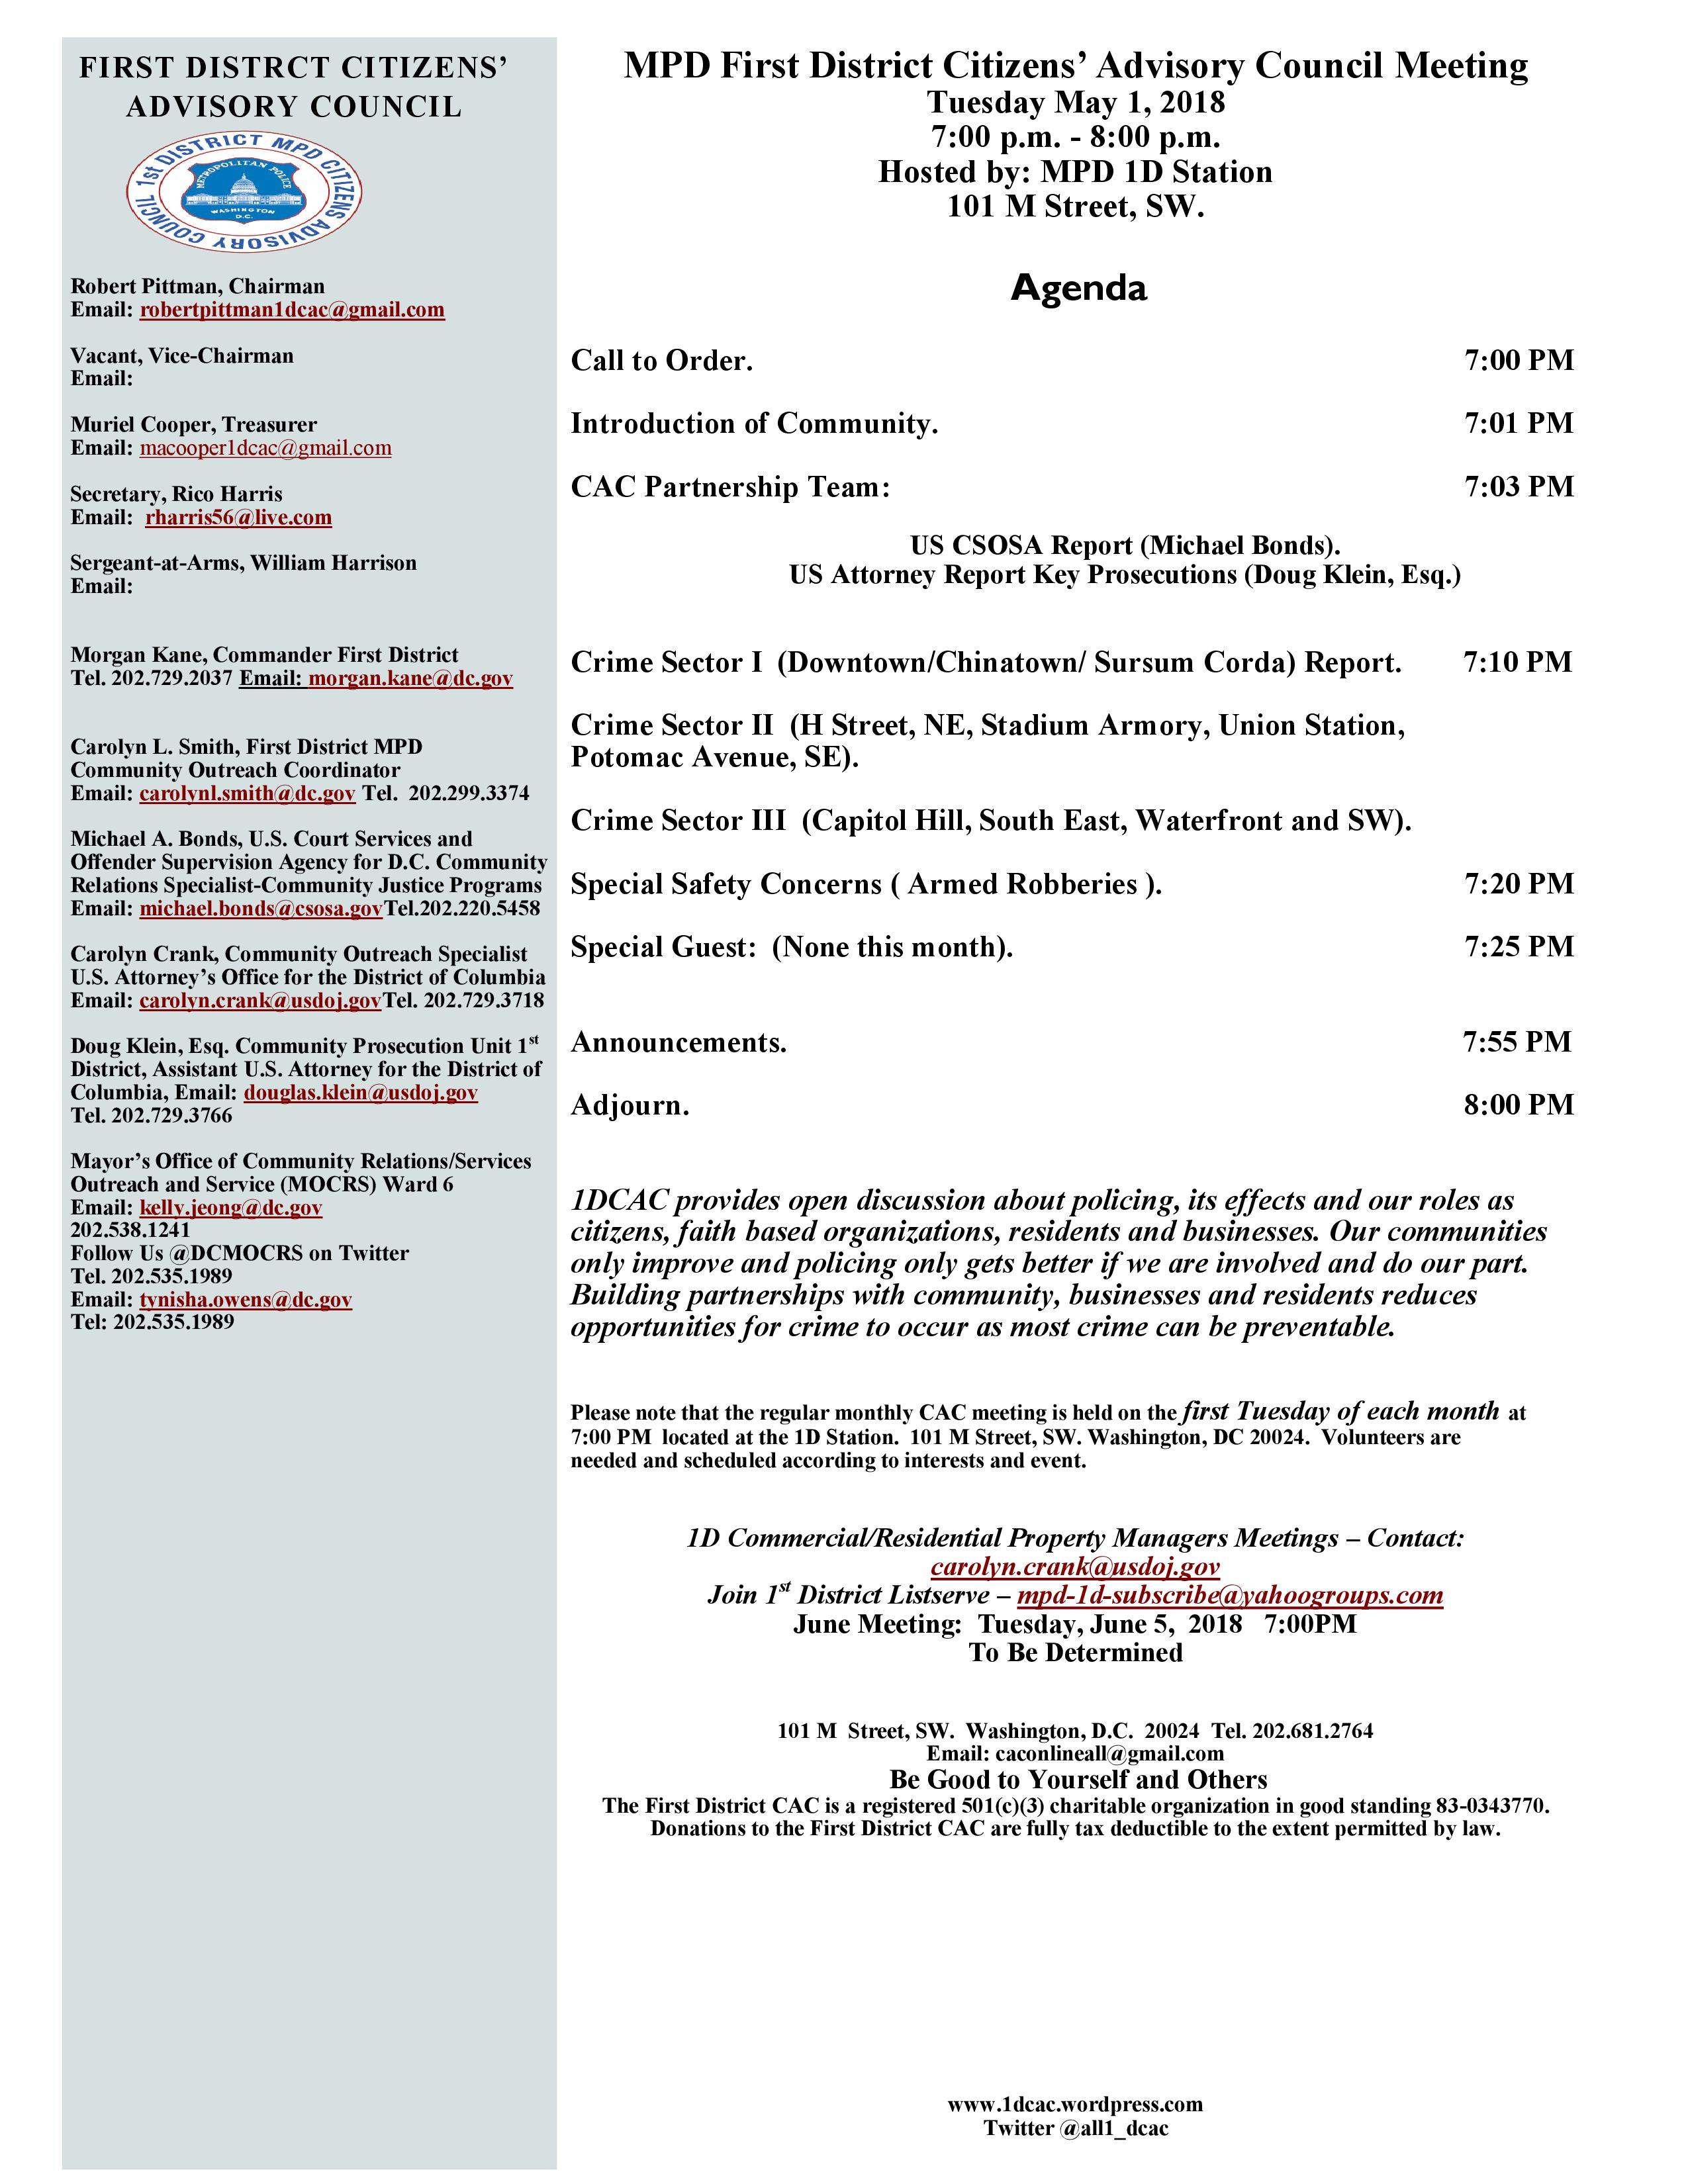 May 1, 2018 Agenda